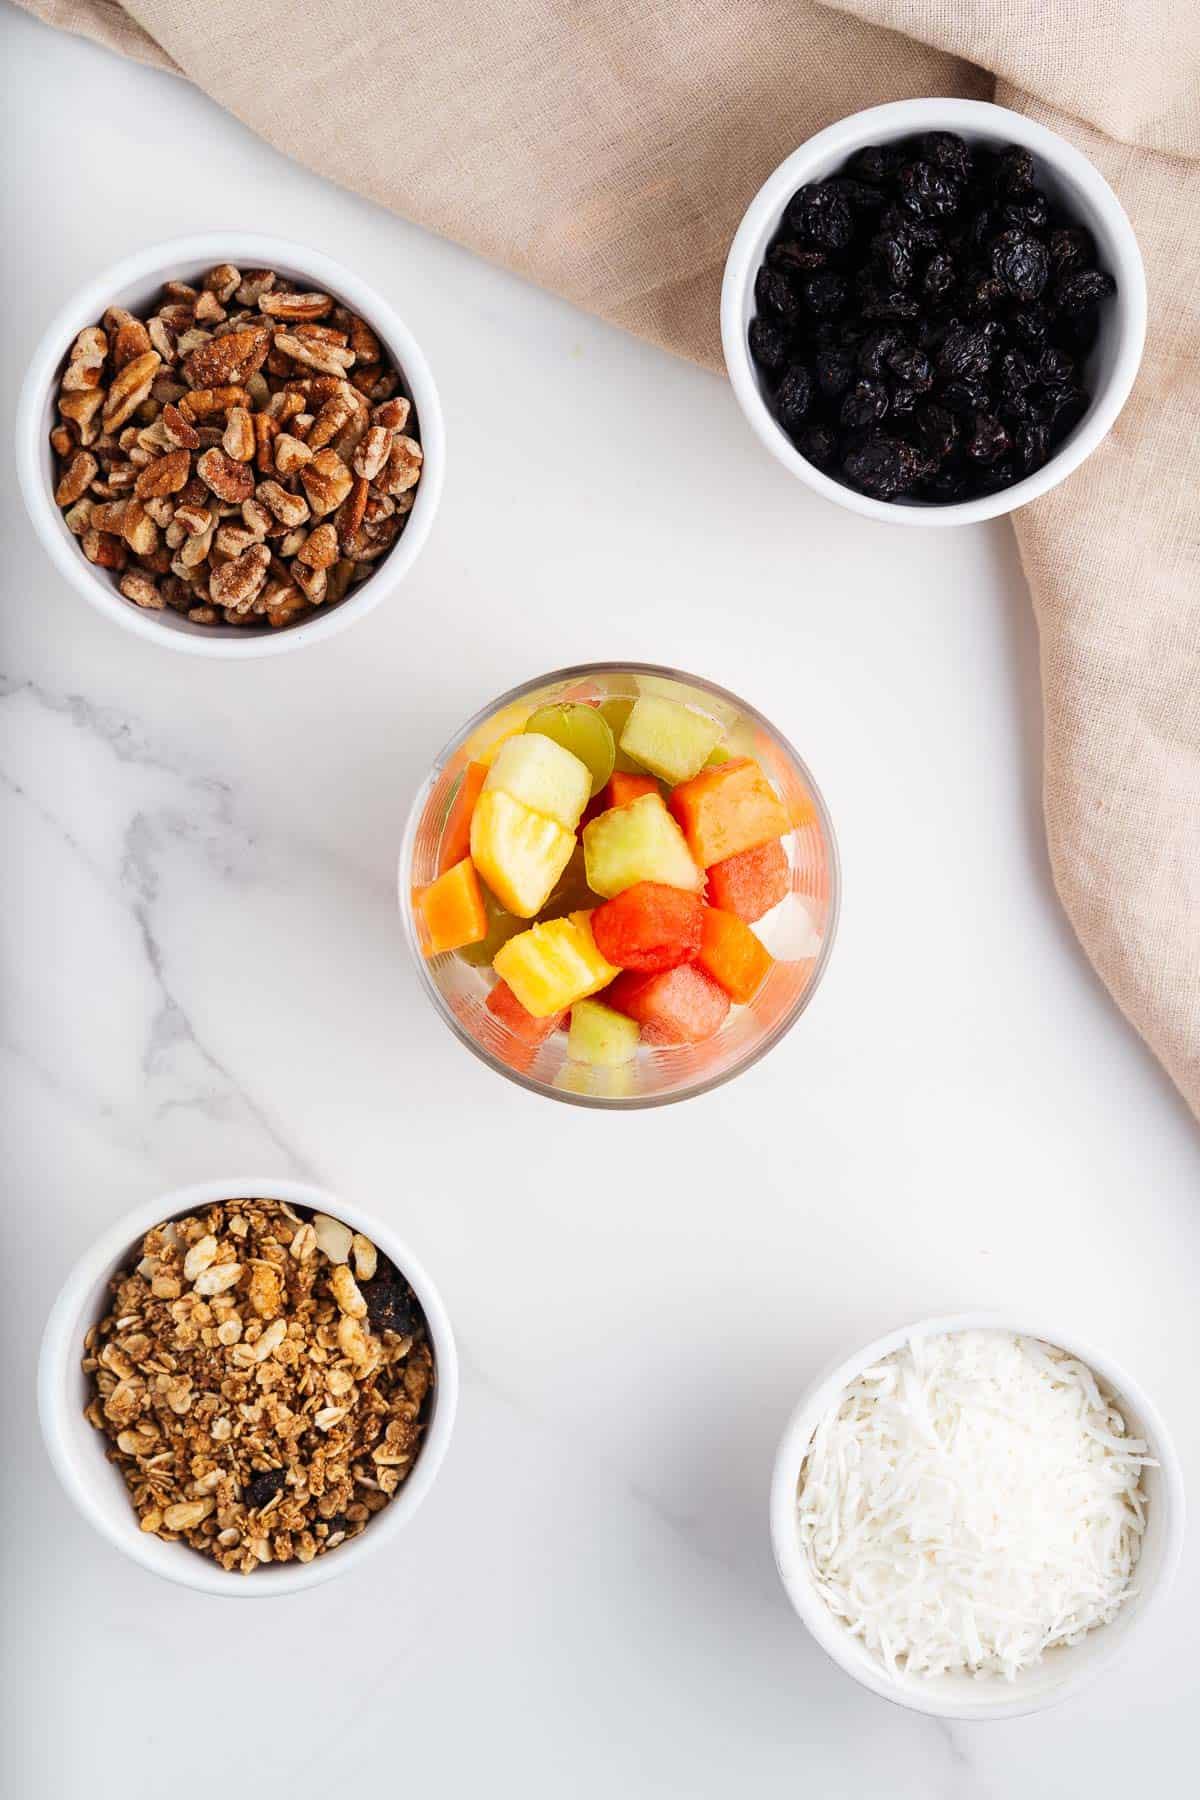 Bionicos Cup, Granola, Coconut Shreds, Raisins, and Pecans